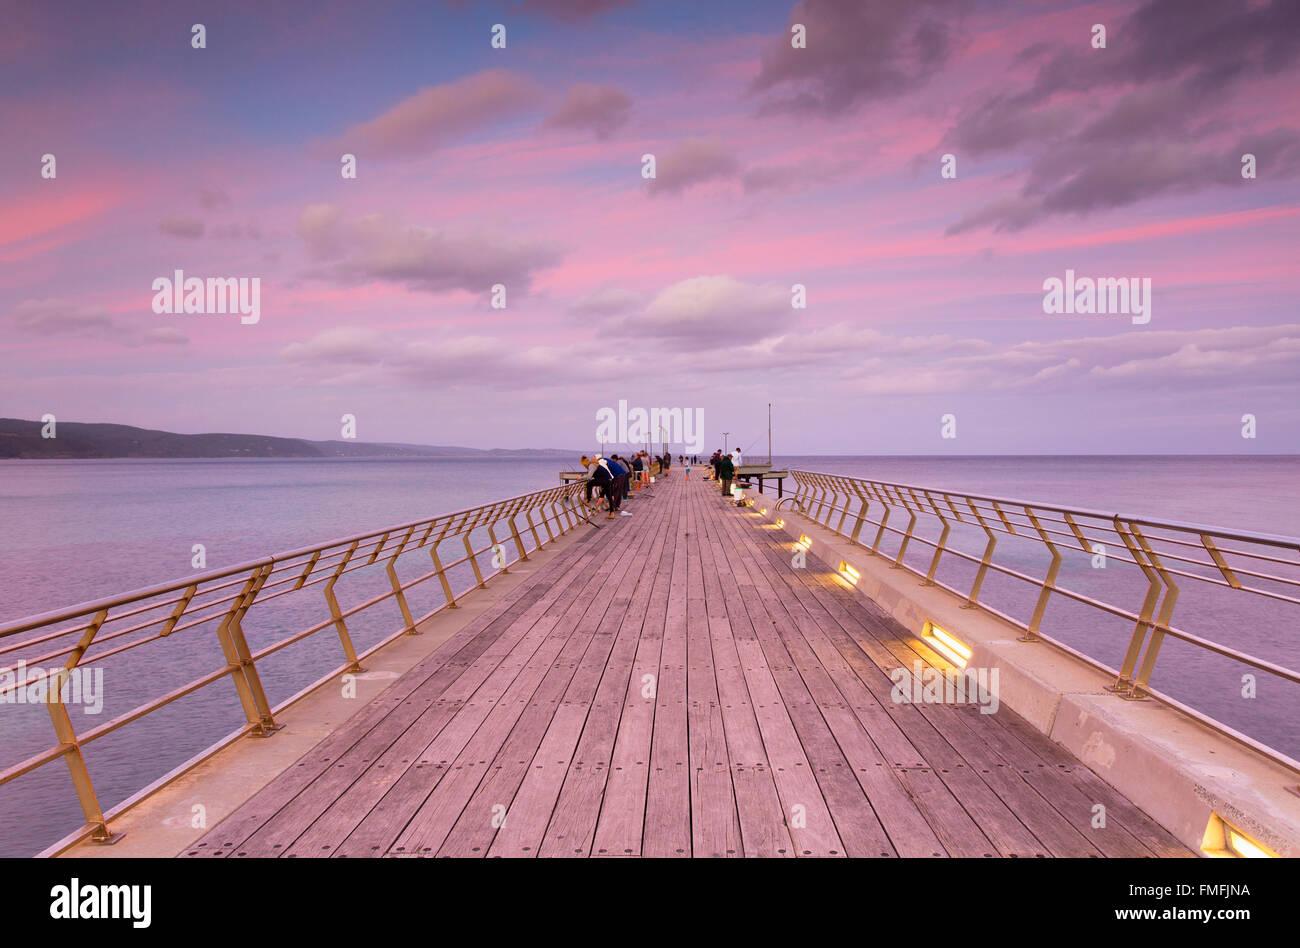 Pier bei Sonnenuntergang, Lorne, Great Ocean Road, Victoria, Australien Stockbild